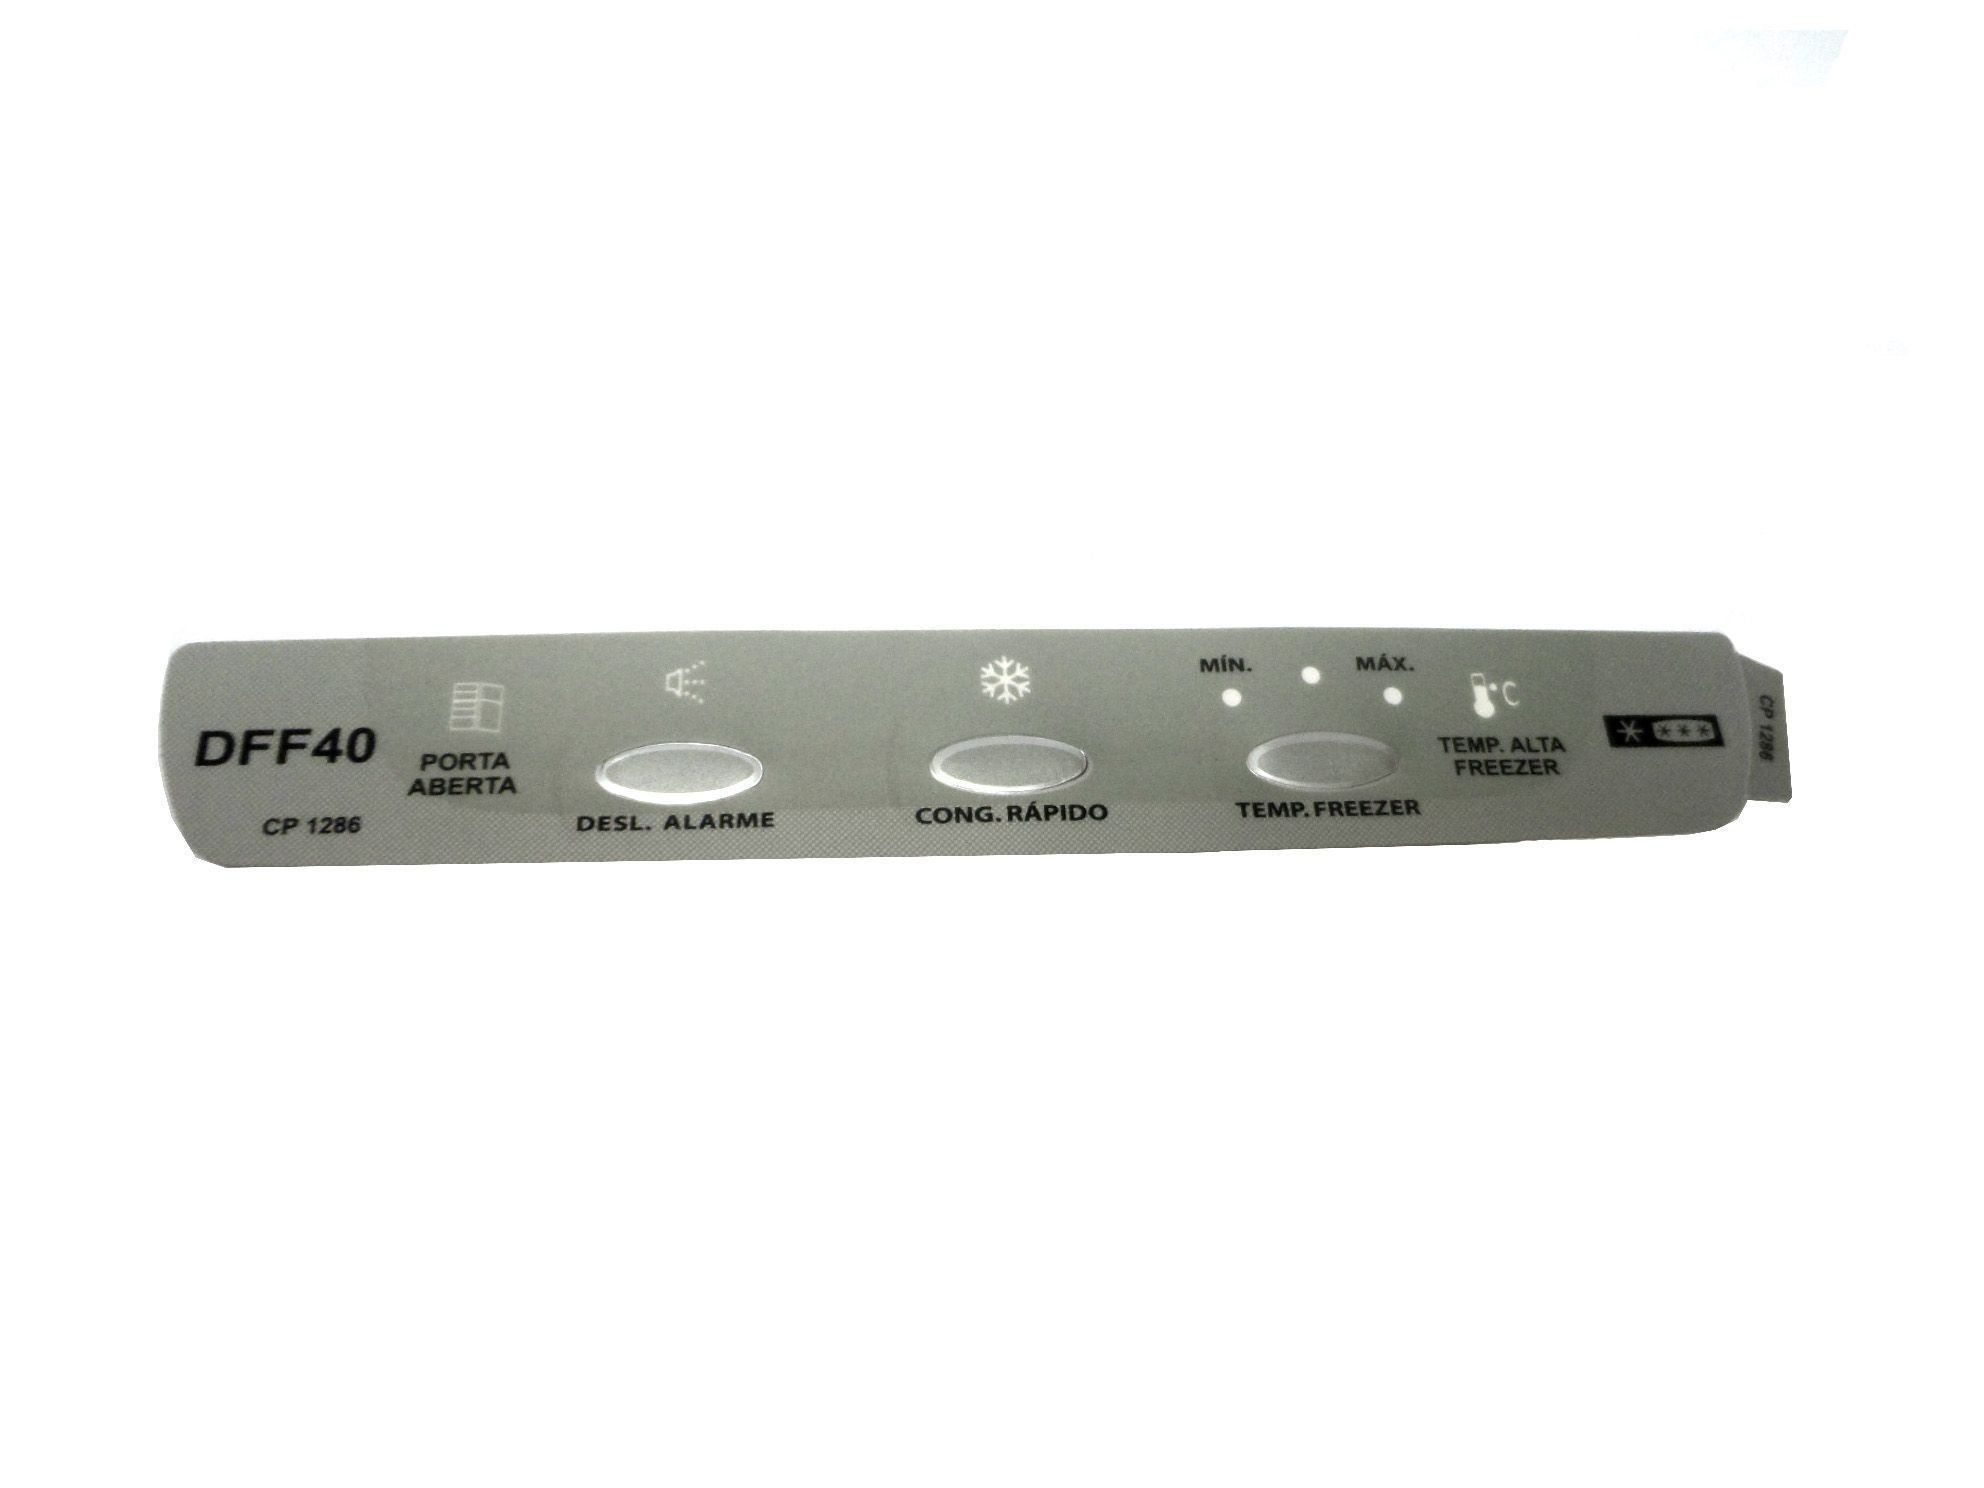 PAINEL DECORATIVO REFRIGERADOR ELECTROLUX DFF40